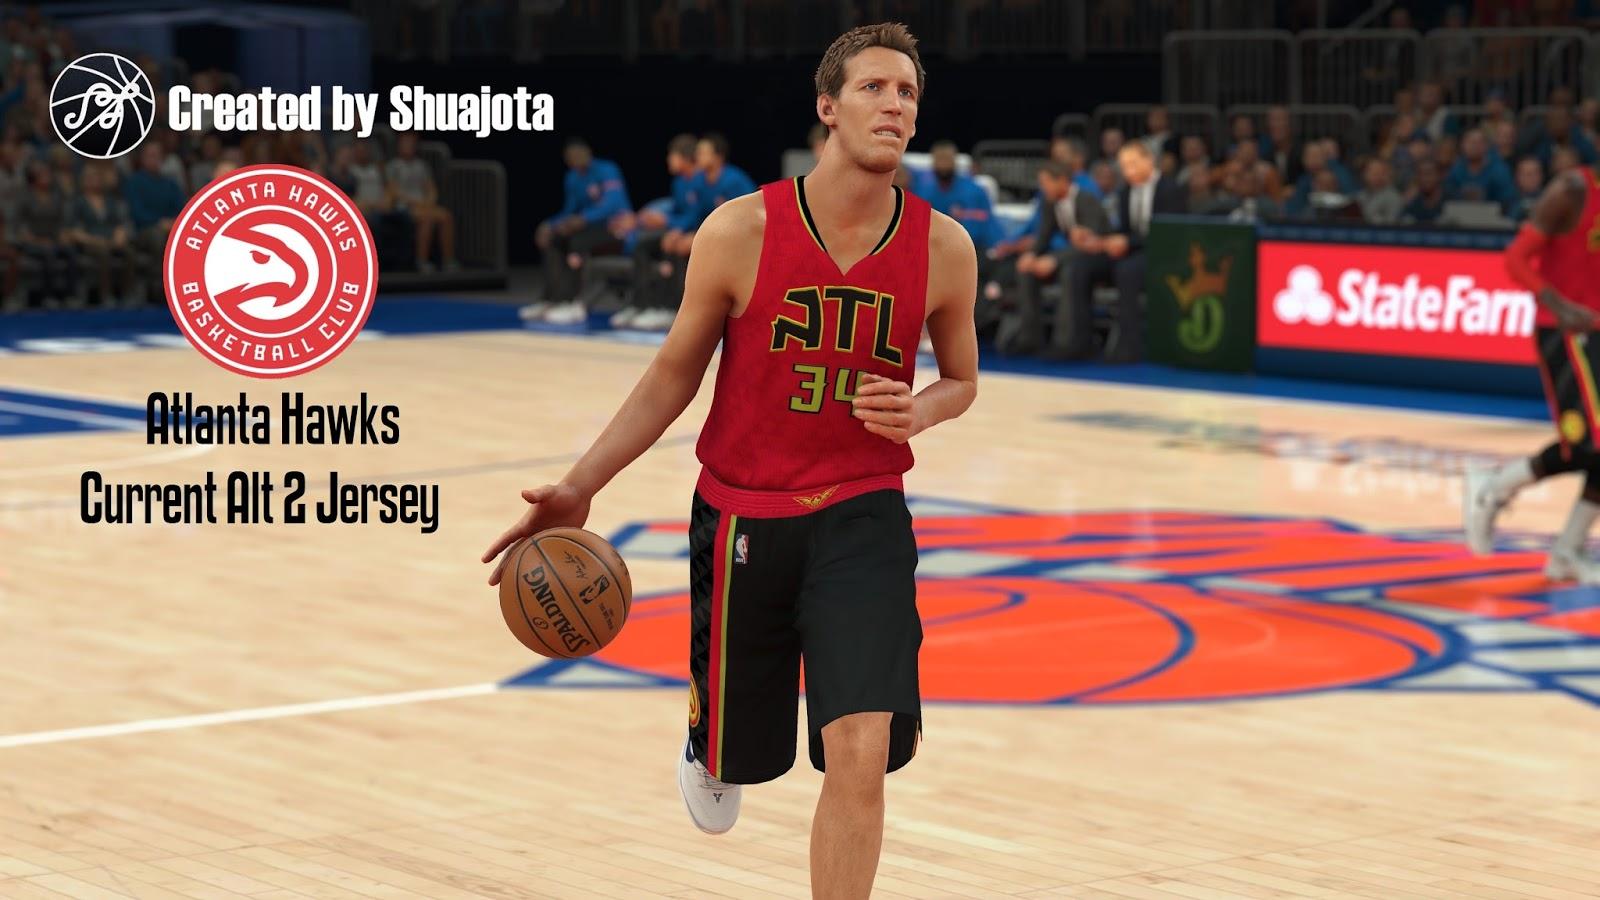 DNA Of Basketball | DNAOBB: NBA 2K17 Atlanta Hawks Current Alt 2 Jersey by Shuajota